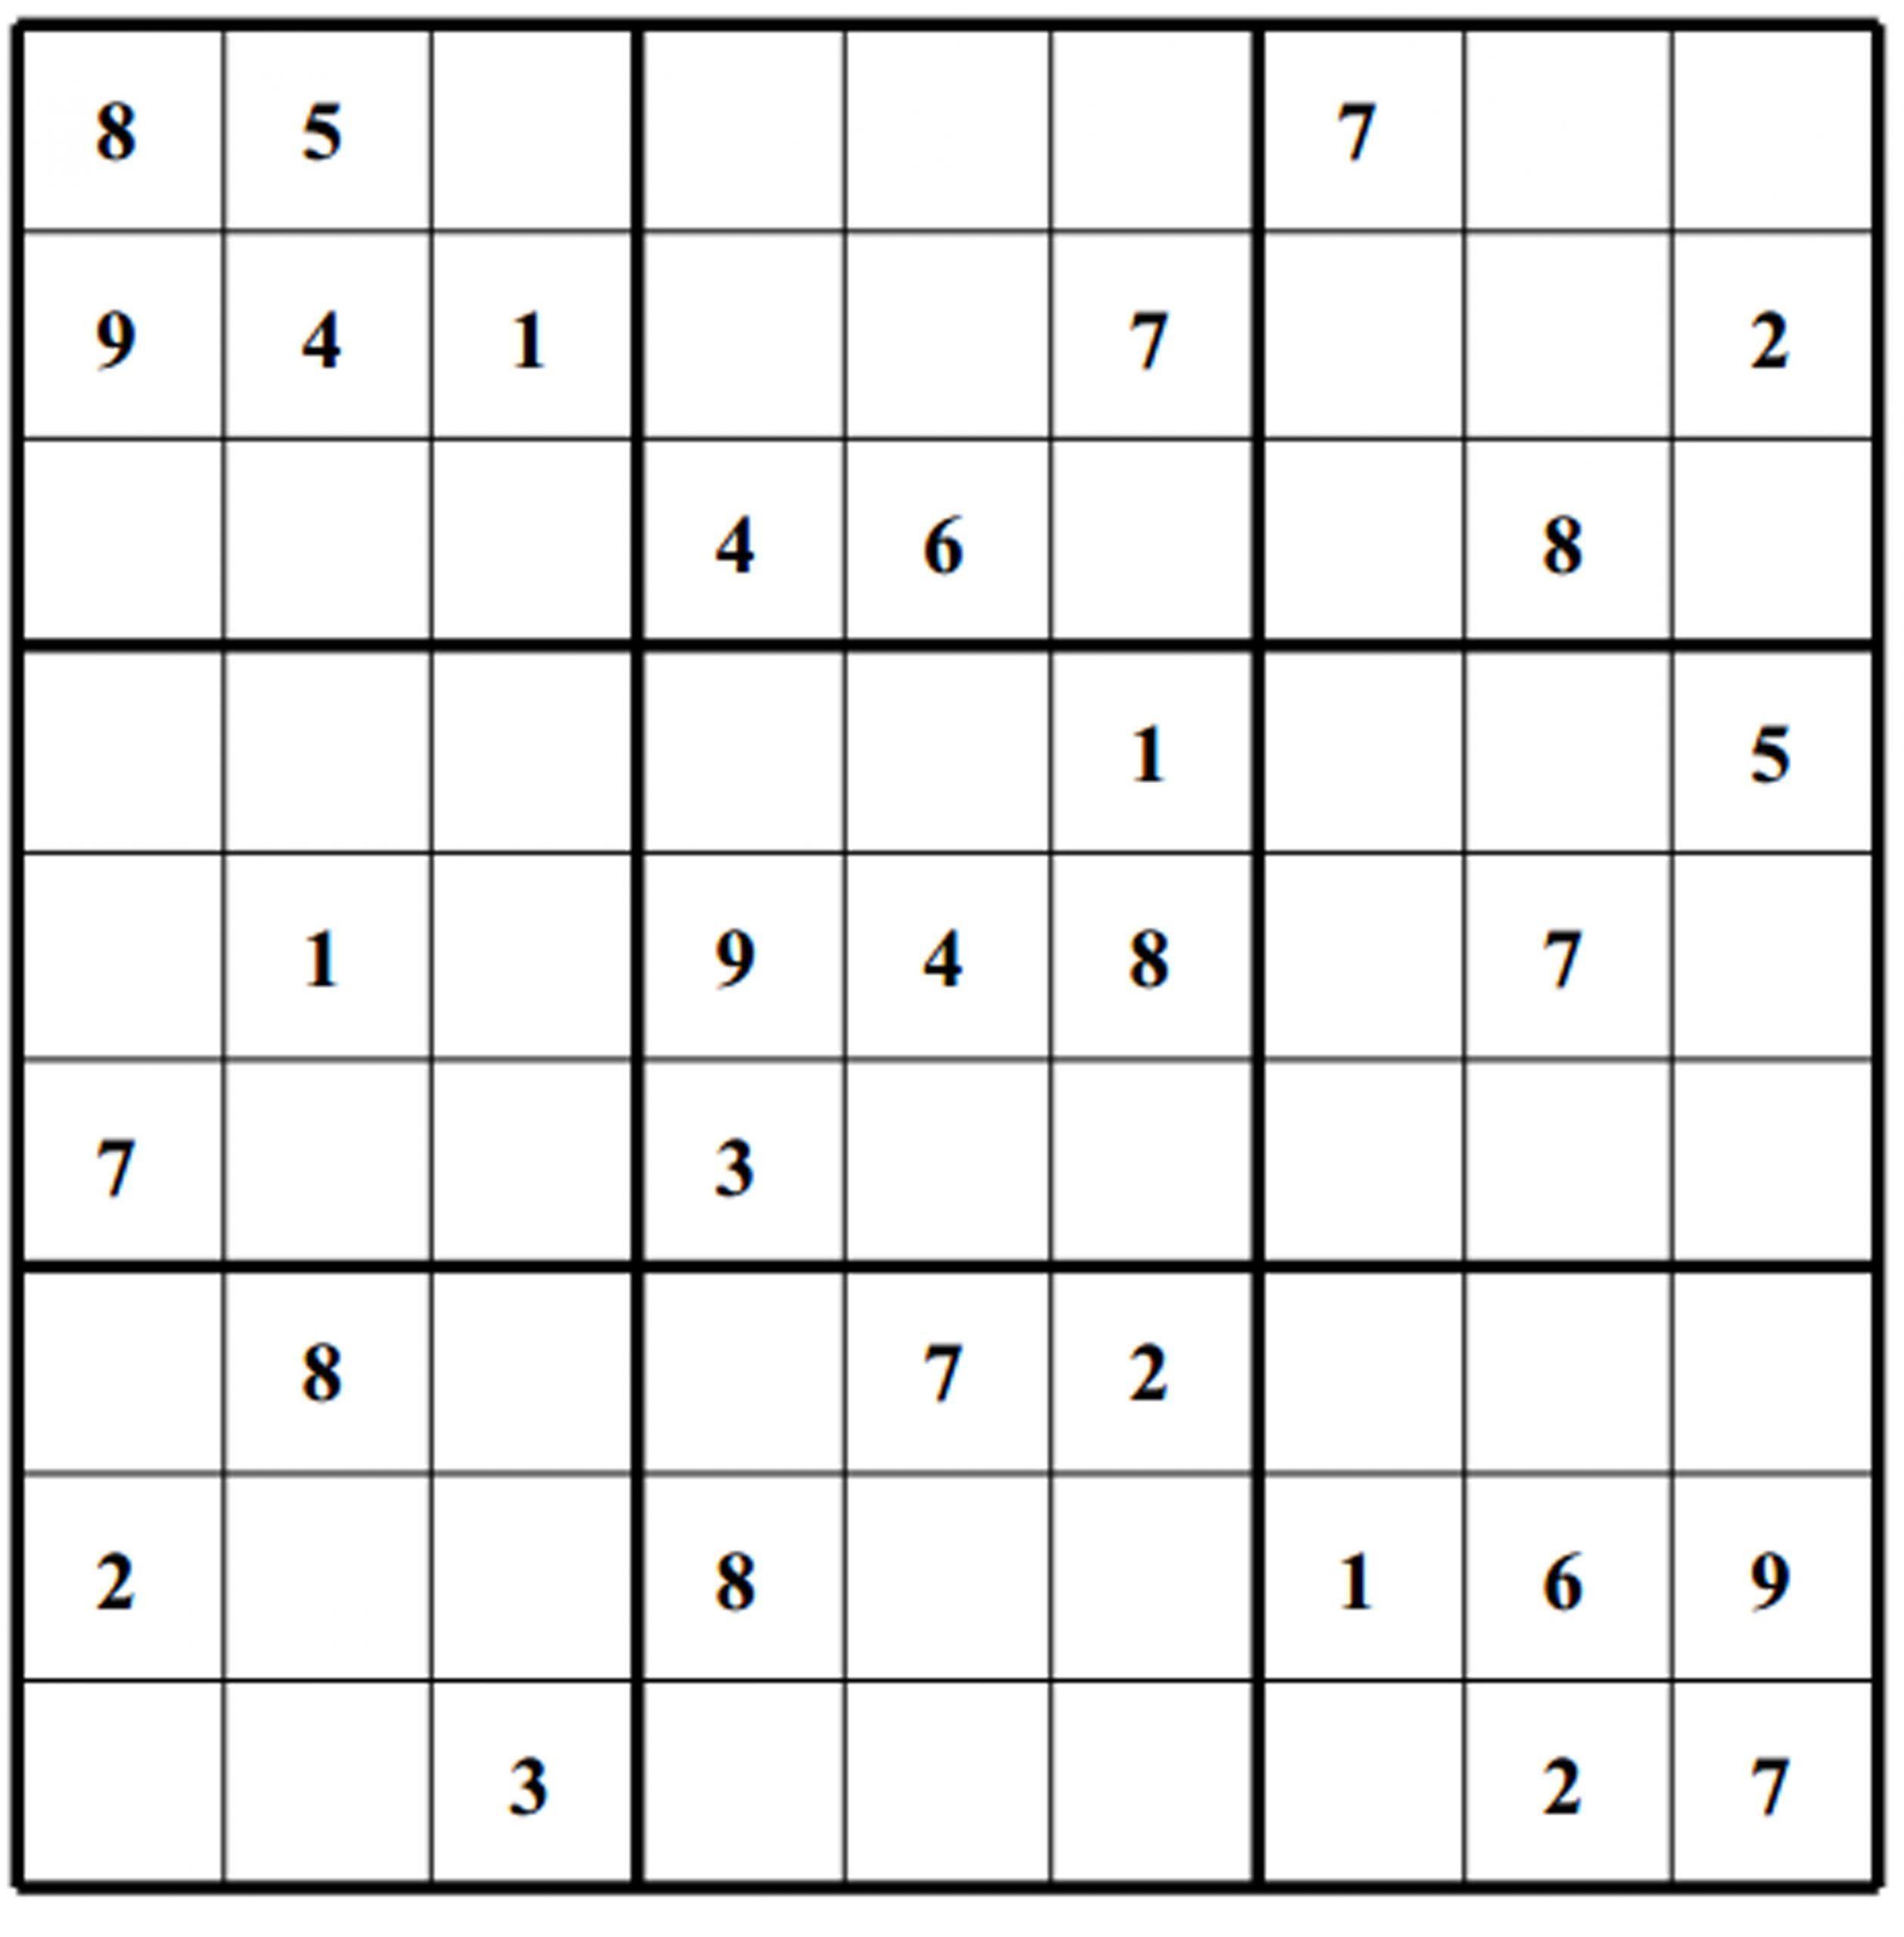 Sudoku Puzzles   Free Sudoku Puzzles   Page 4 avec Sudoku Facile Avec Solution